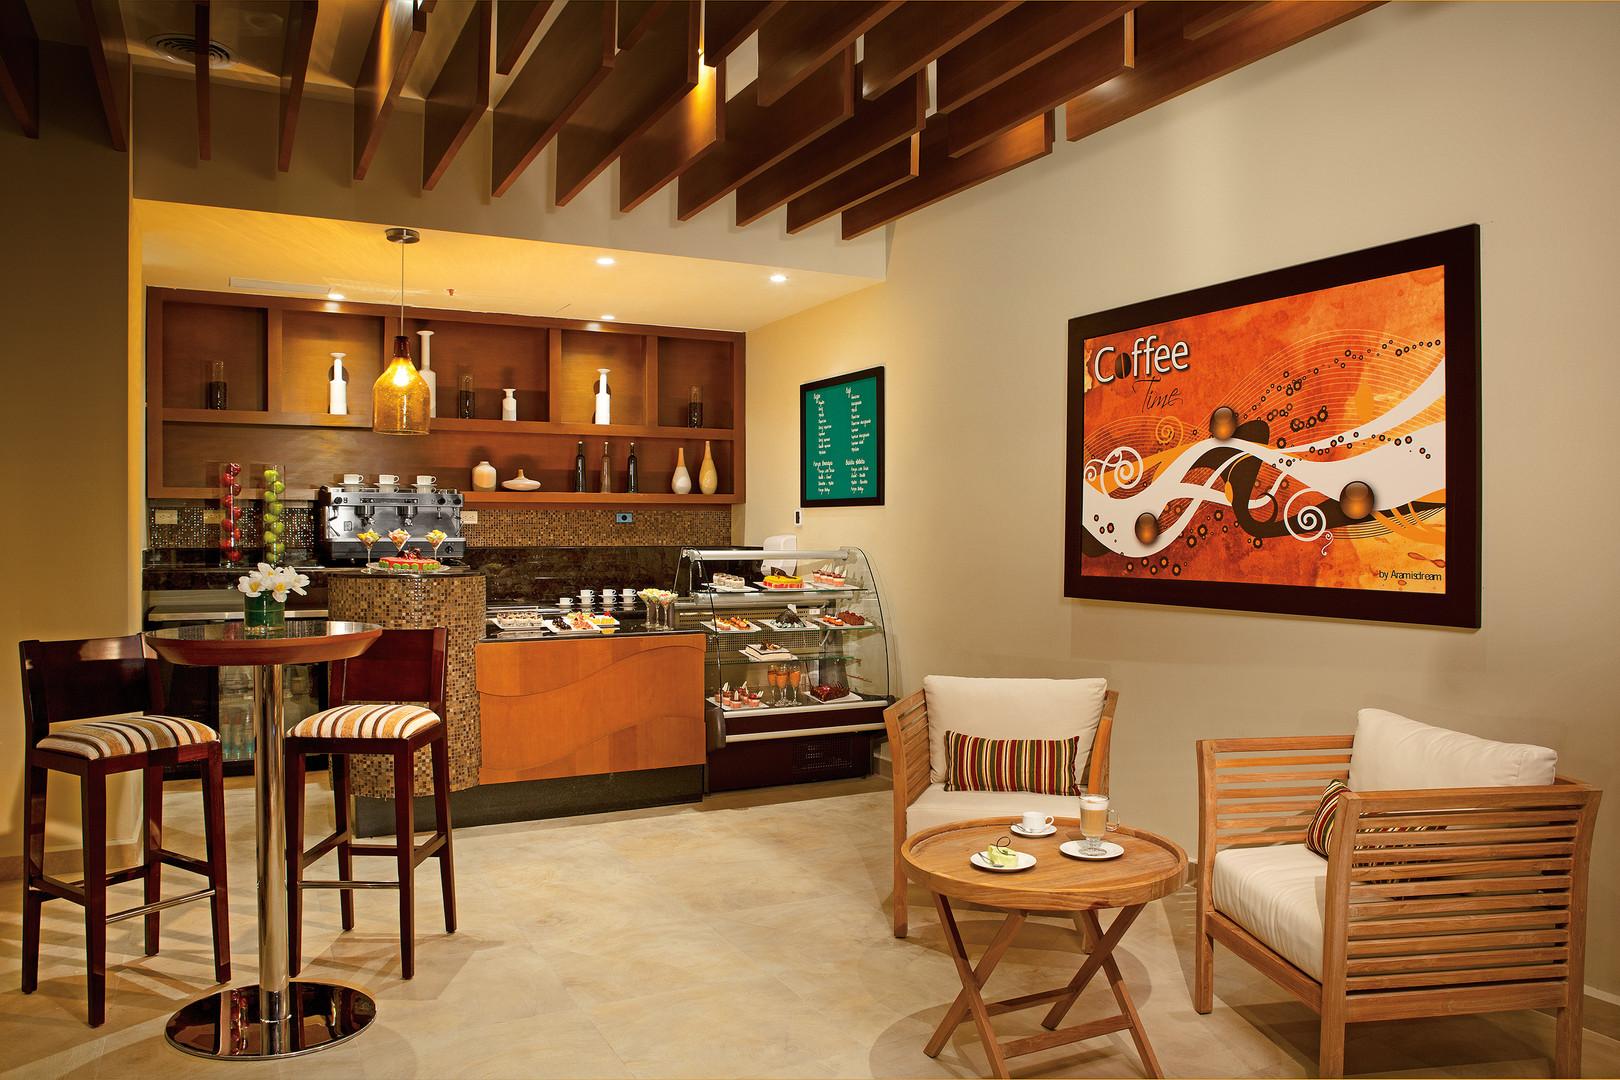 Coco Café   Premium Coffee & Pastries